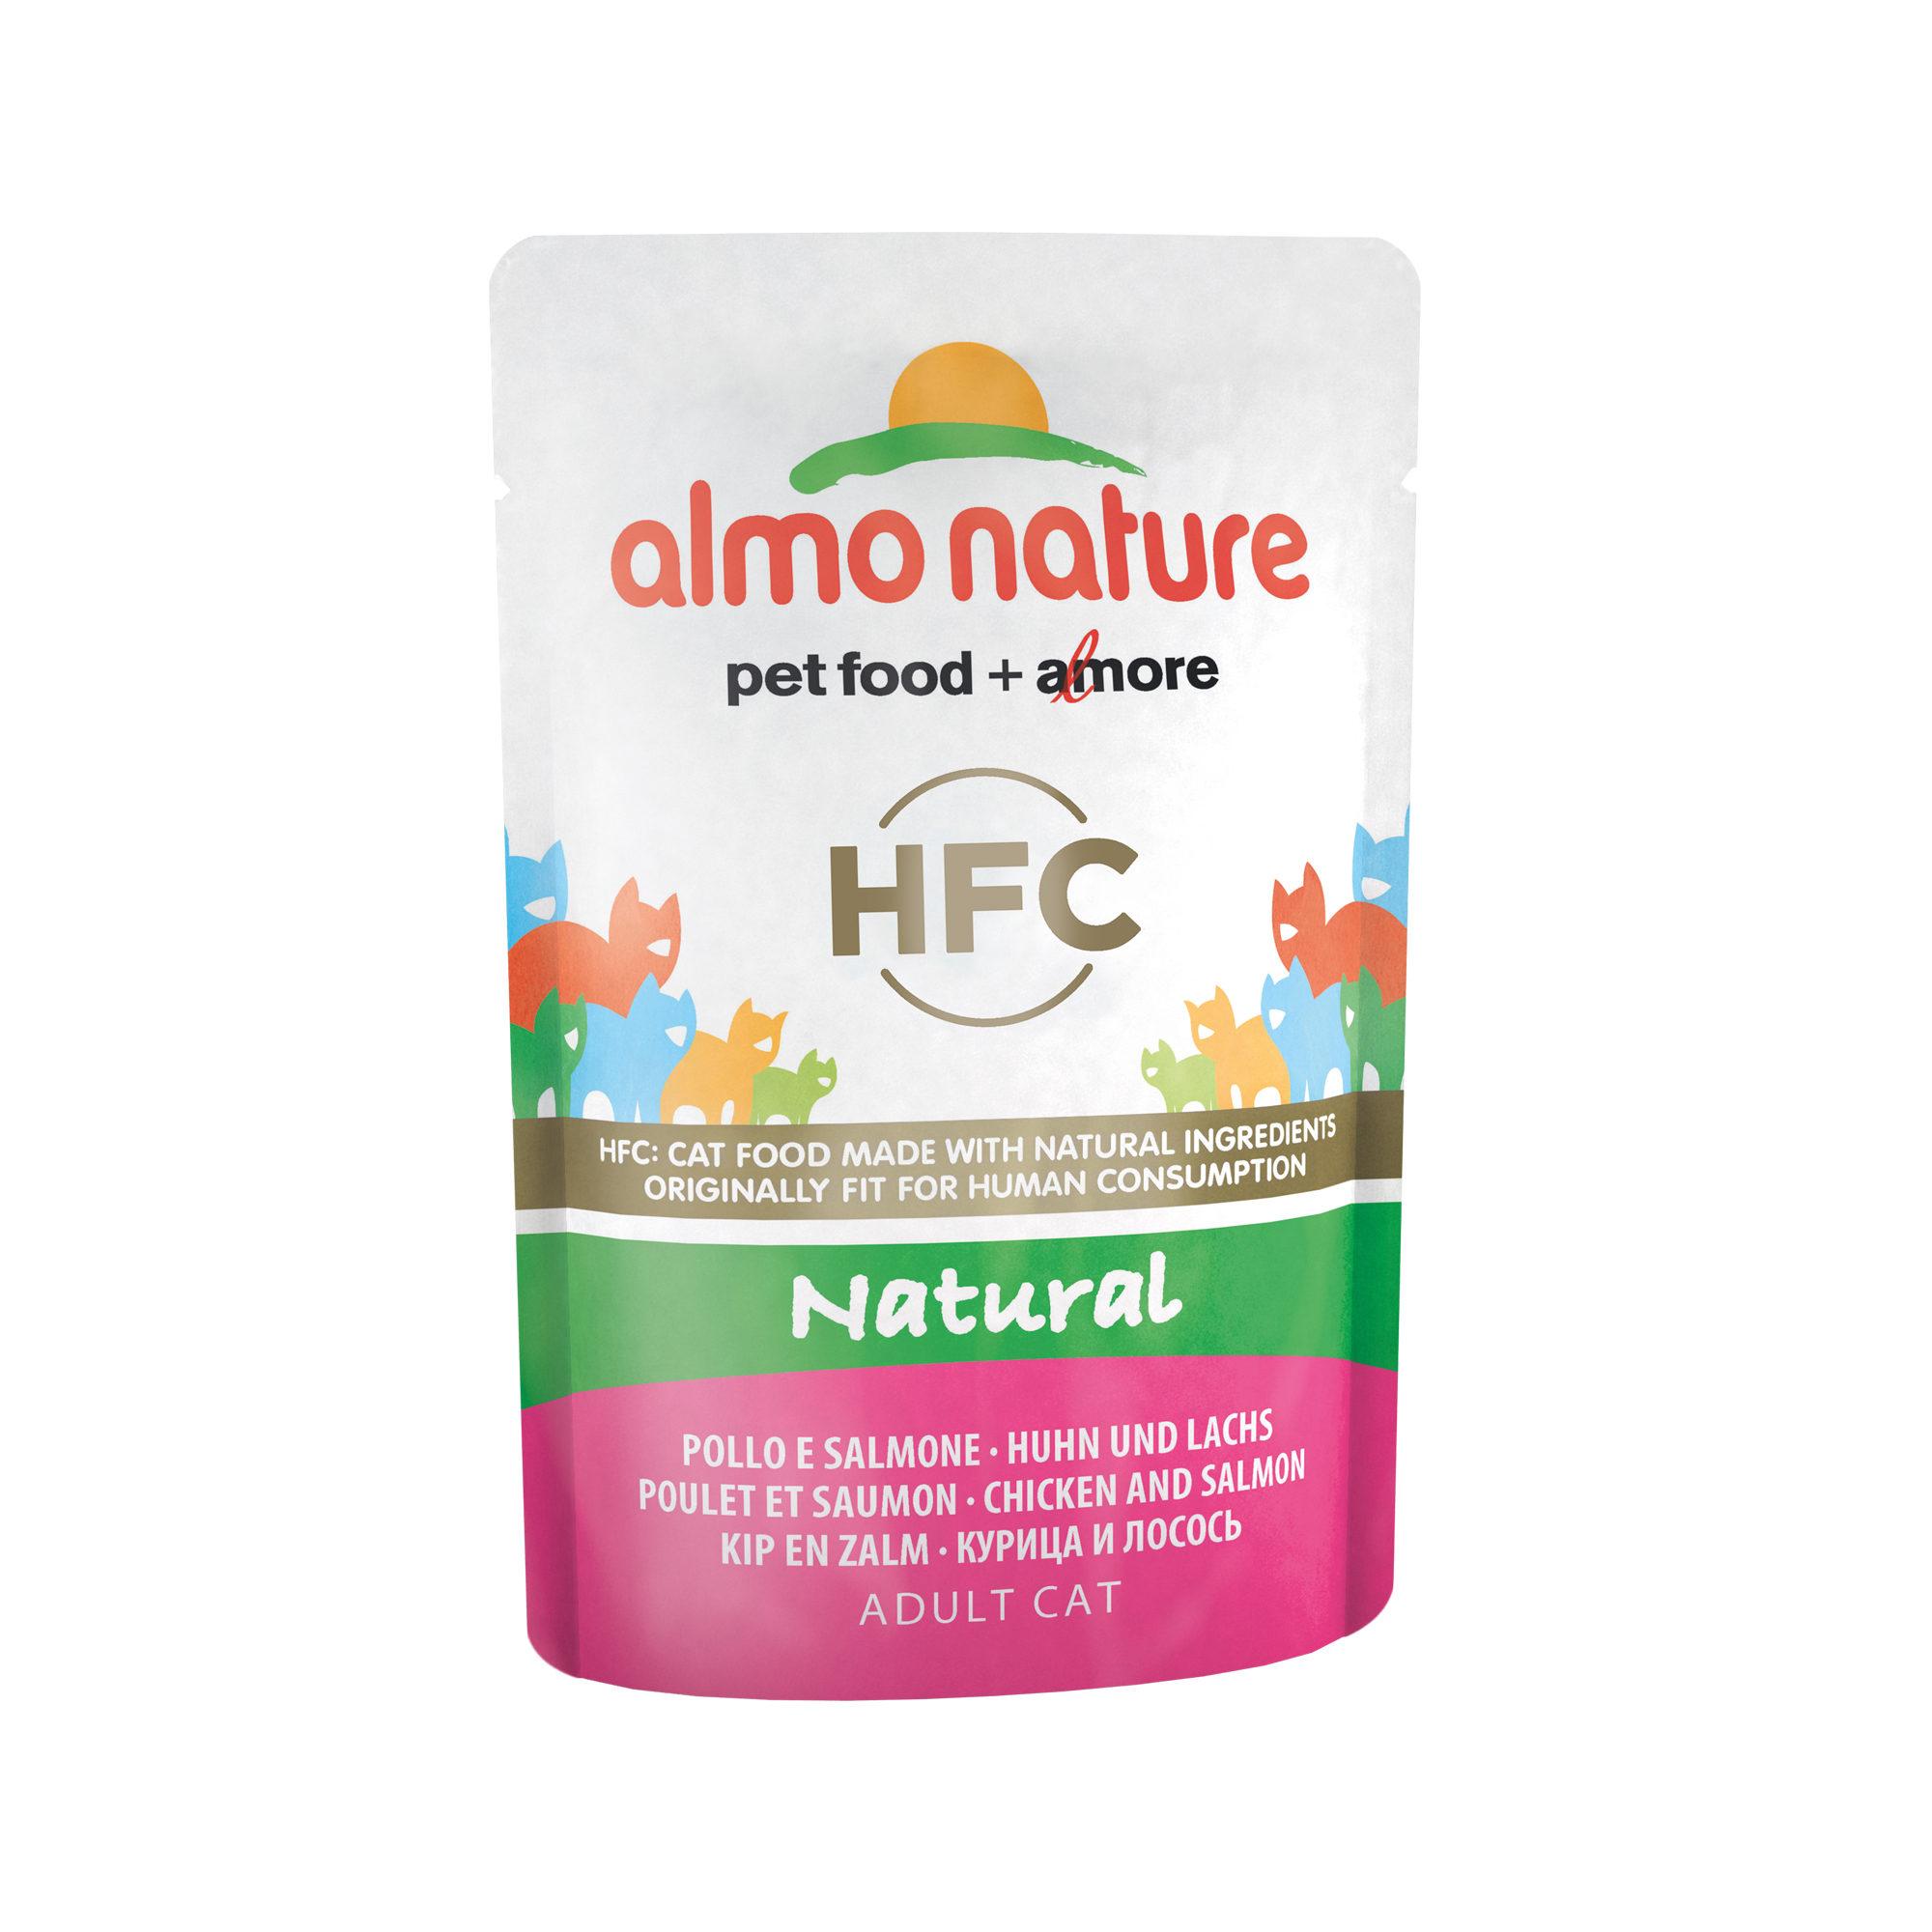 Almo Nature HFC Natural Katzenfutter - Dosen - Huhn & Lachs - 24 x 55 g